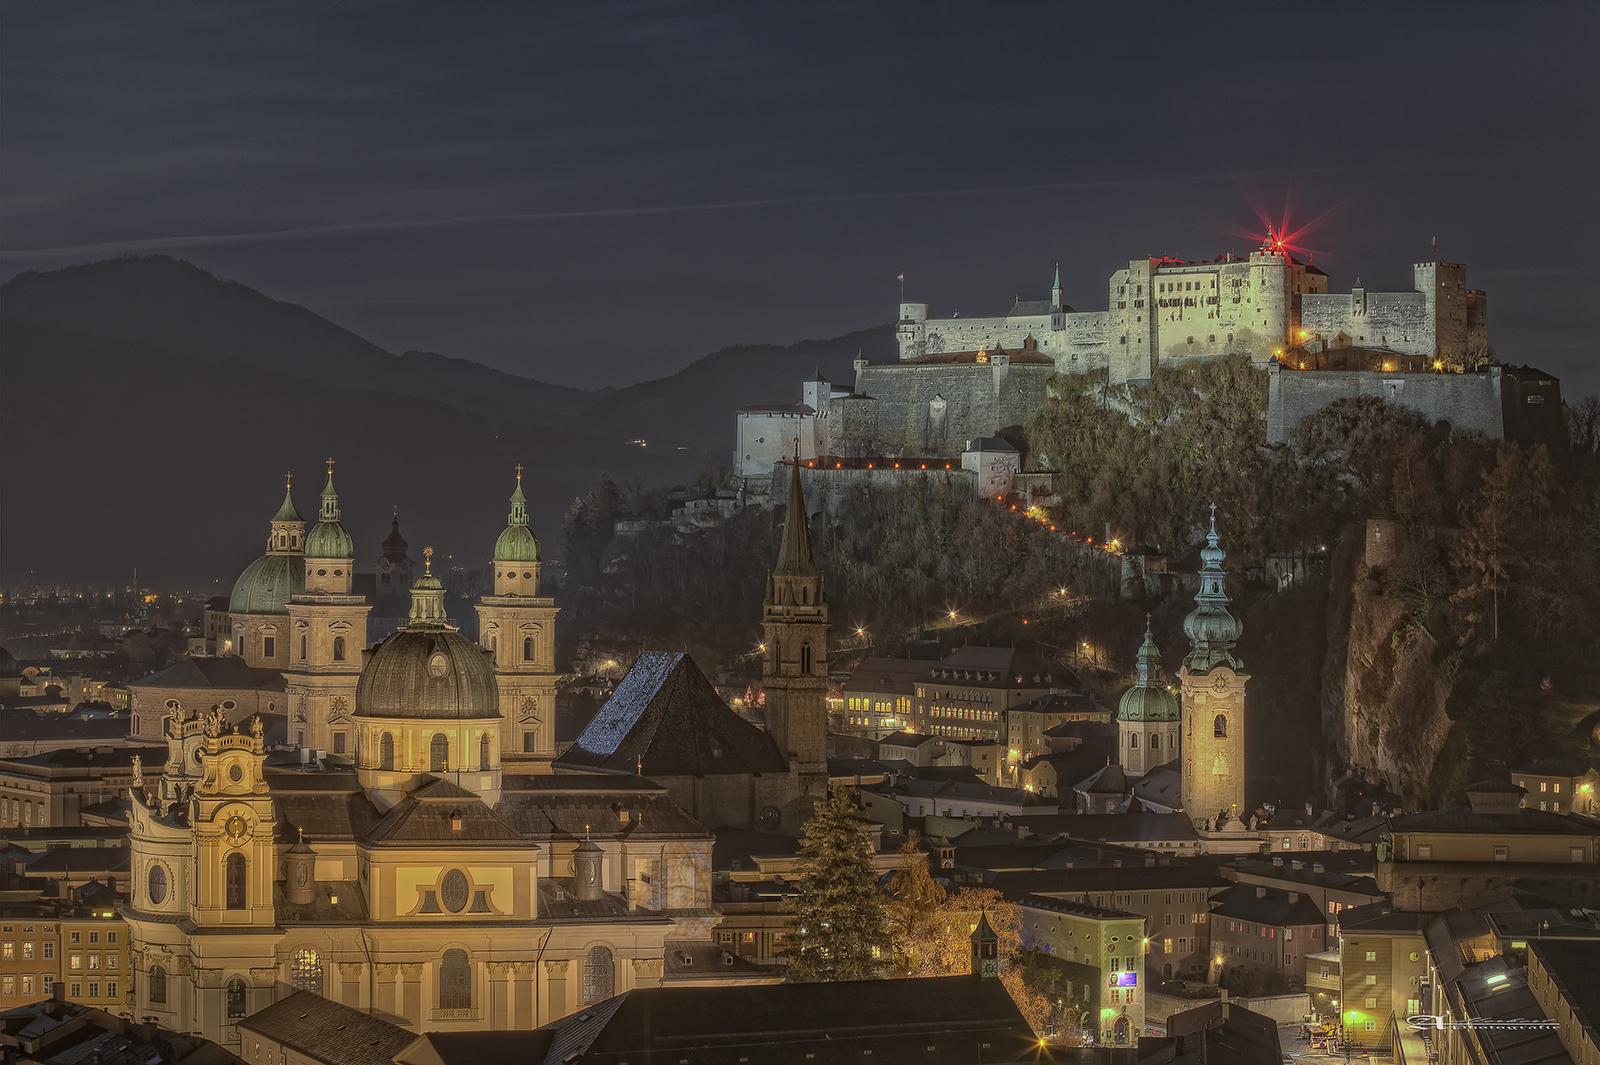 Salzburg Impression II